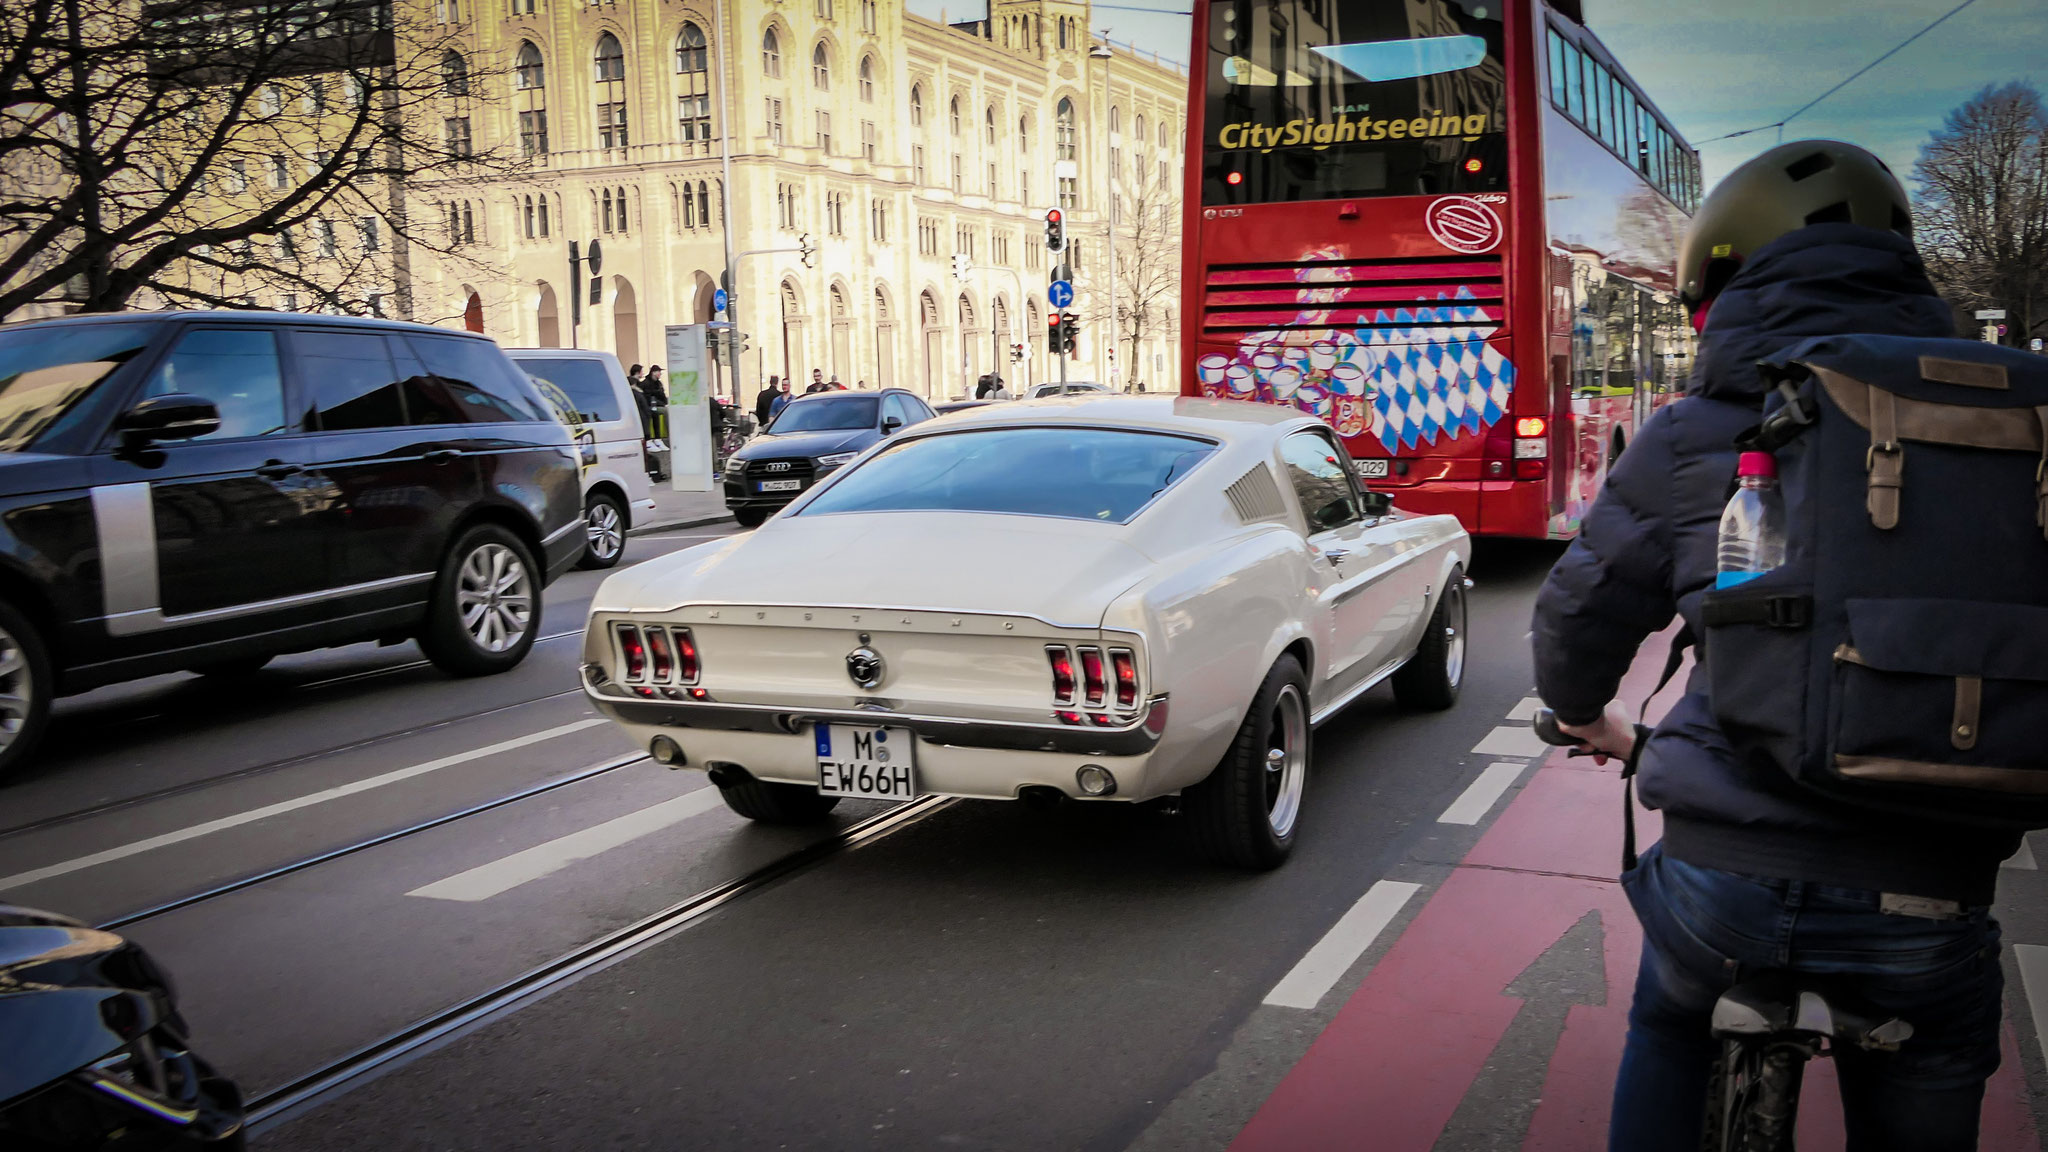 Mustang I - M-EW-66H